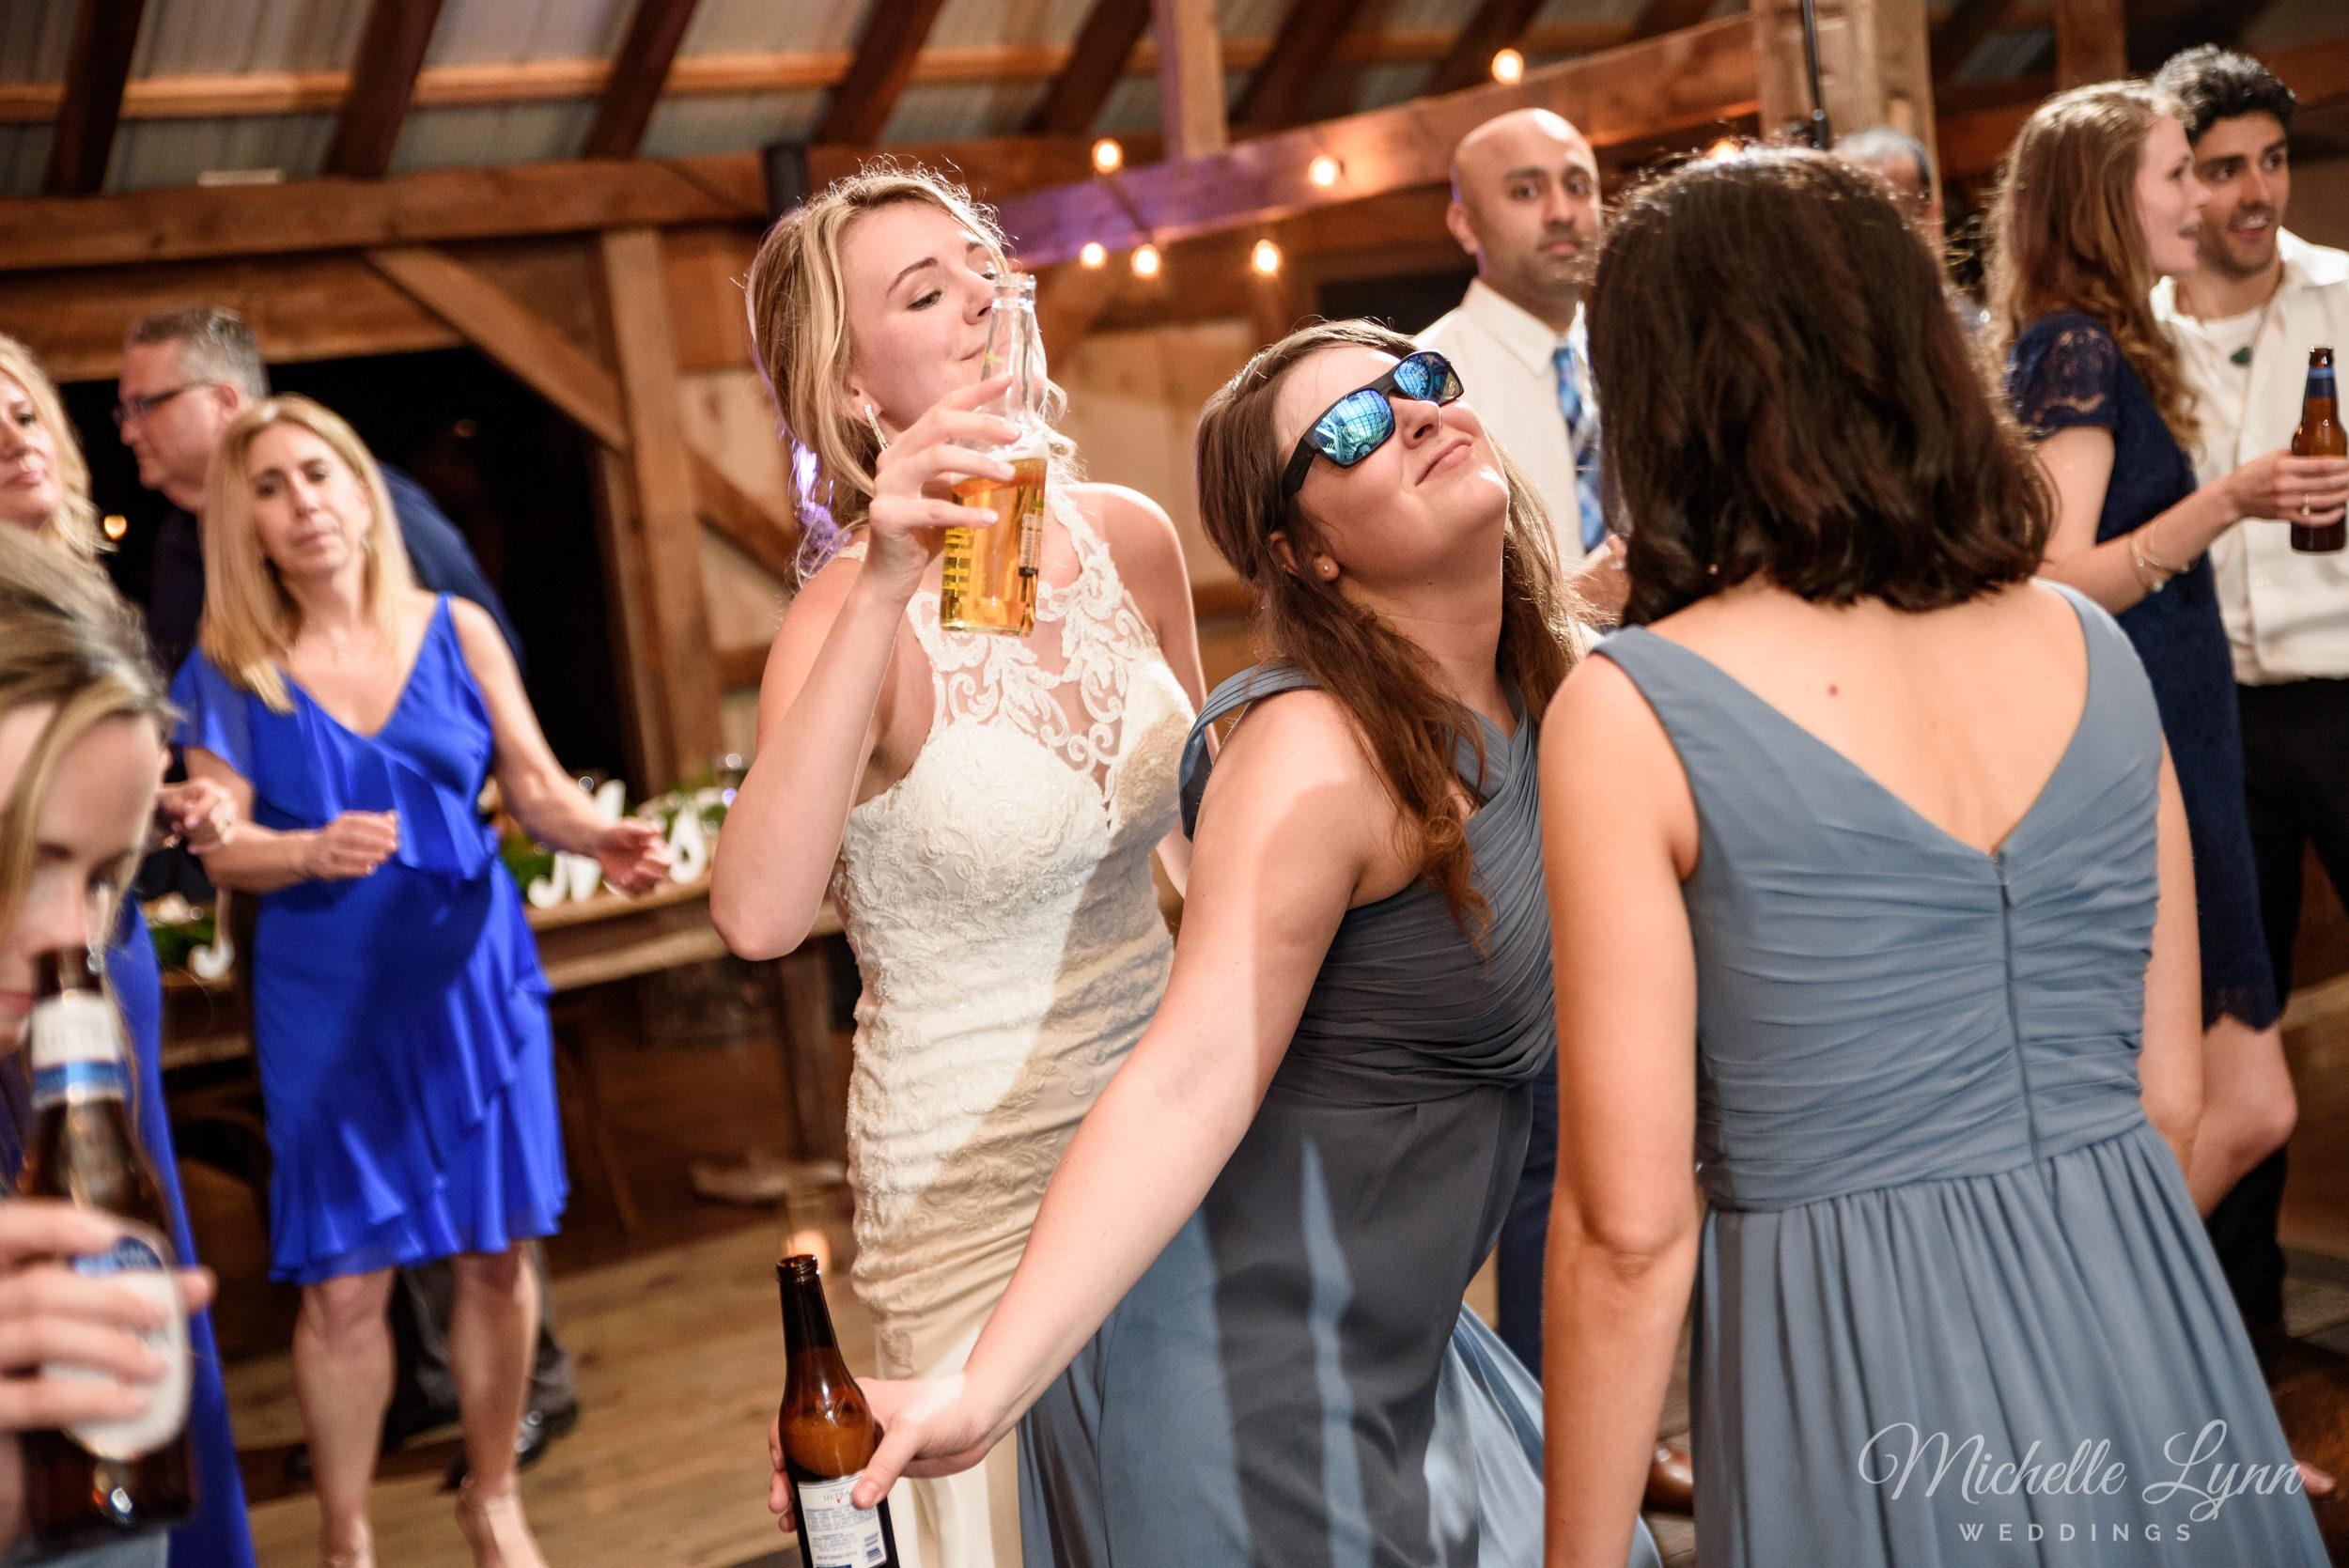 mlw-the-farm-bakery-and-events-wedding-photos-94.jpg